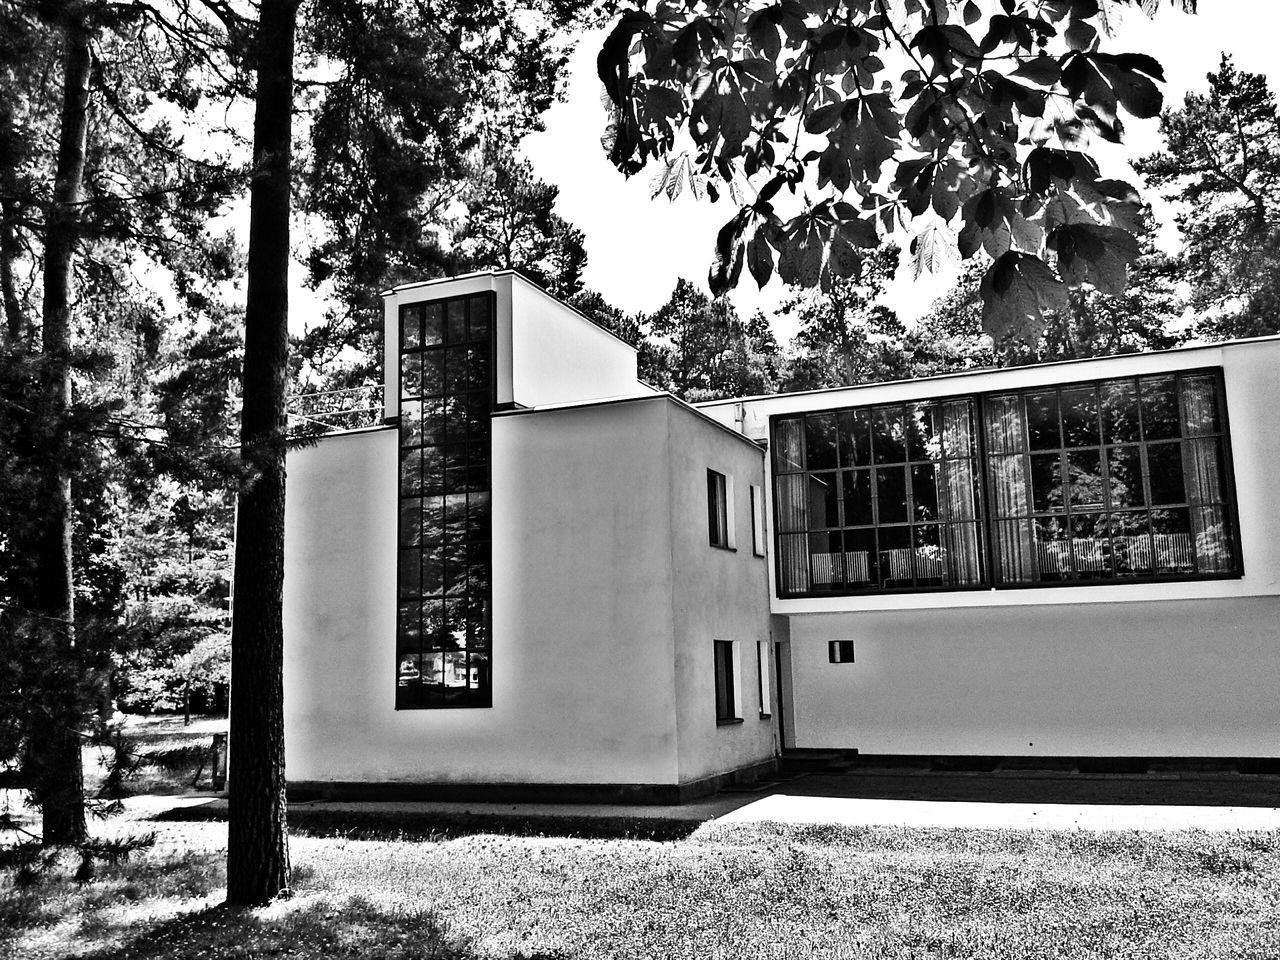 Design The Architect - 2014 EyeEm AwardsBlackandwhite Bauhaus